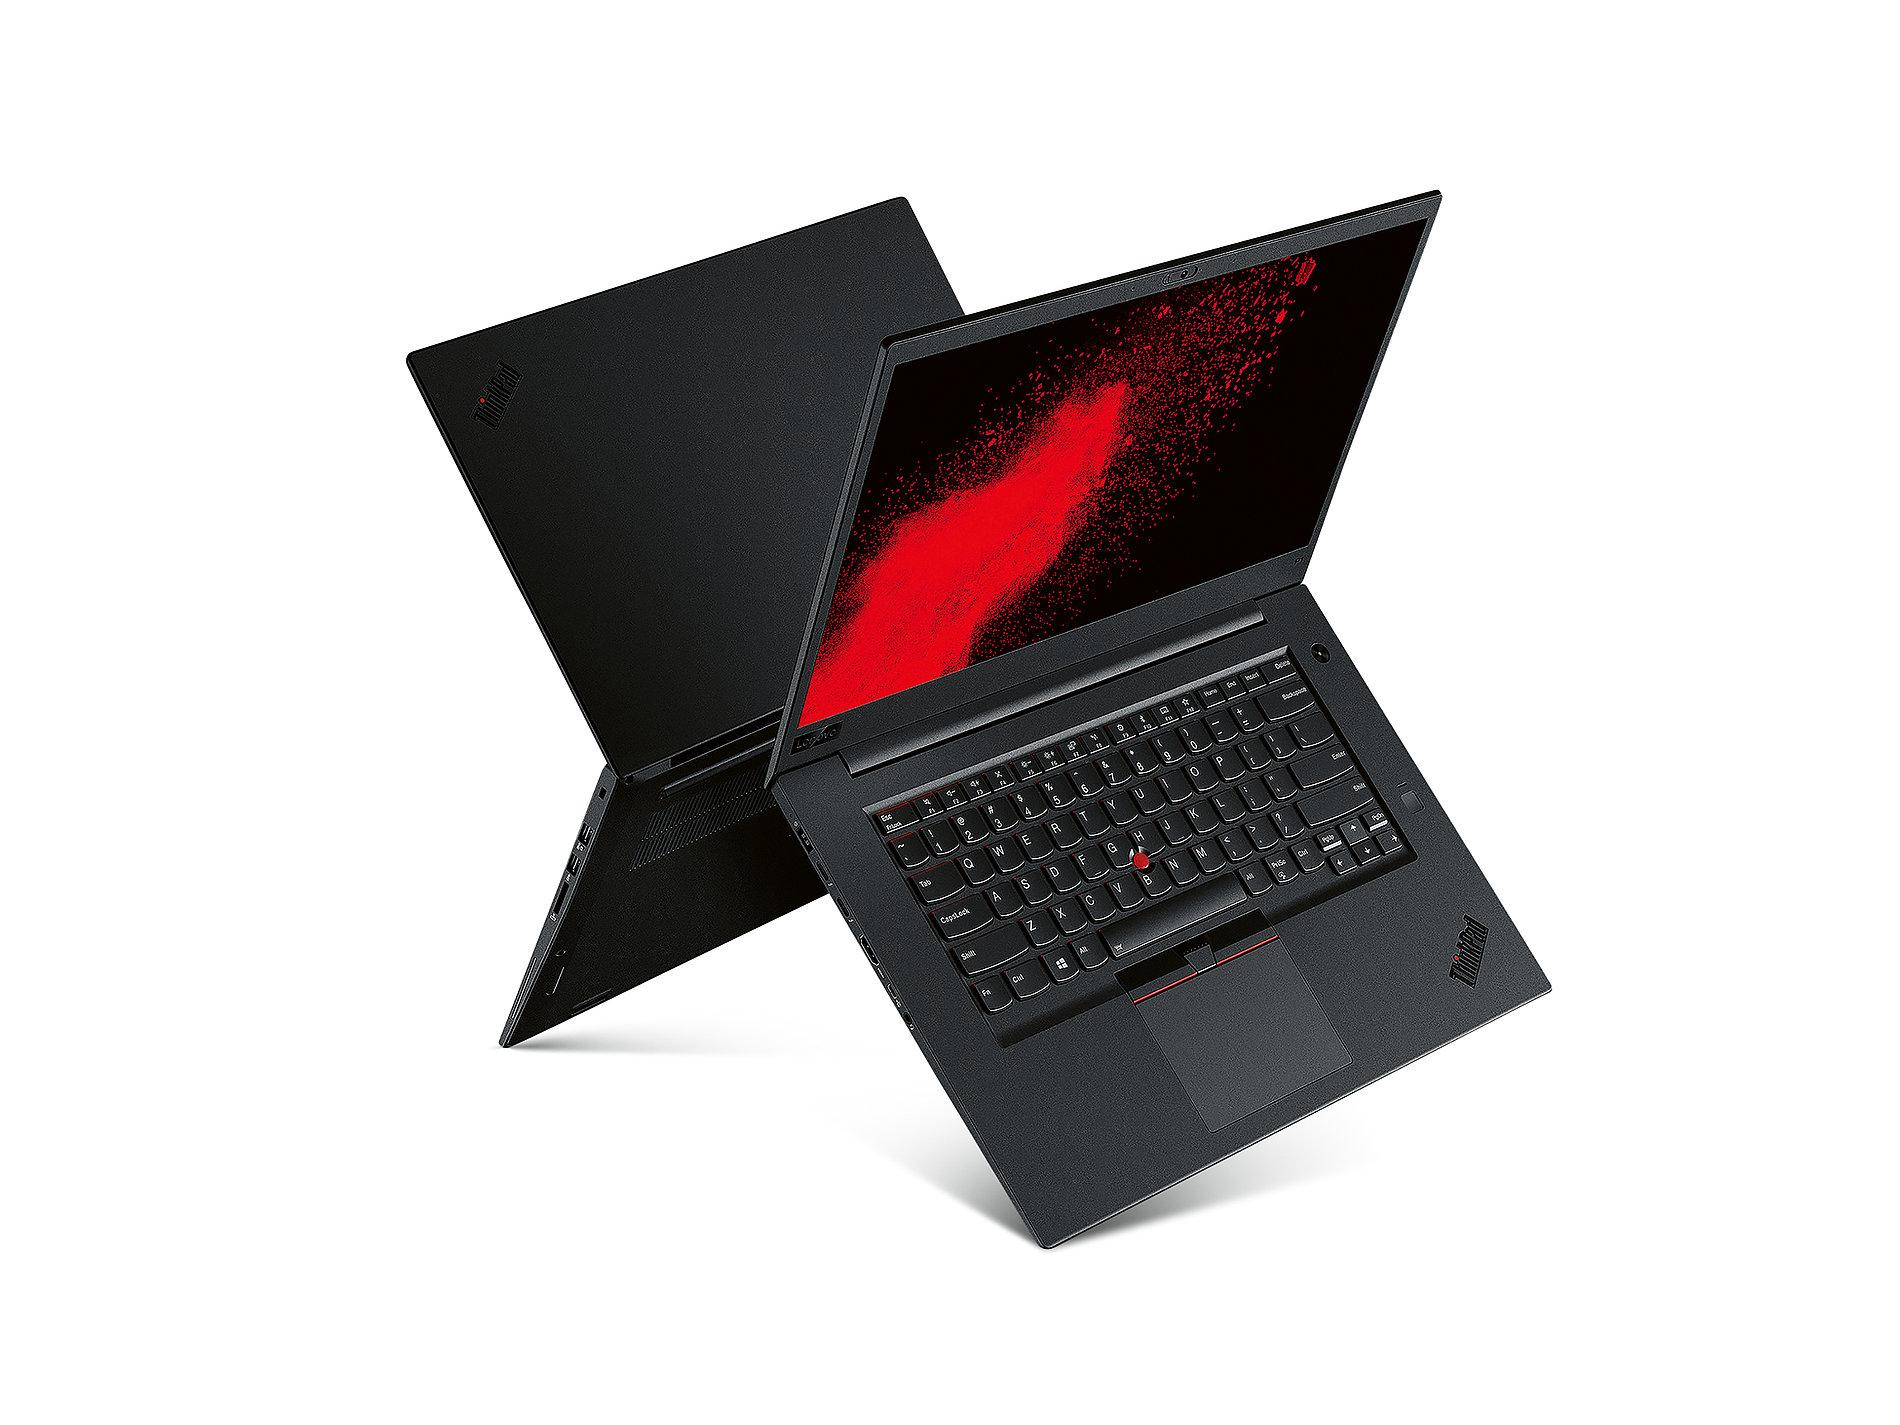 ThinkPad X1 Extreme, ThinkPad P1 | Red Dot Design Award